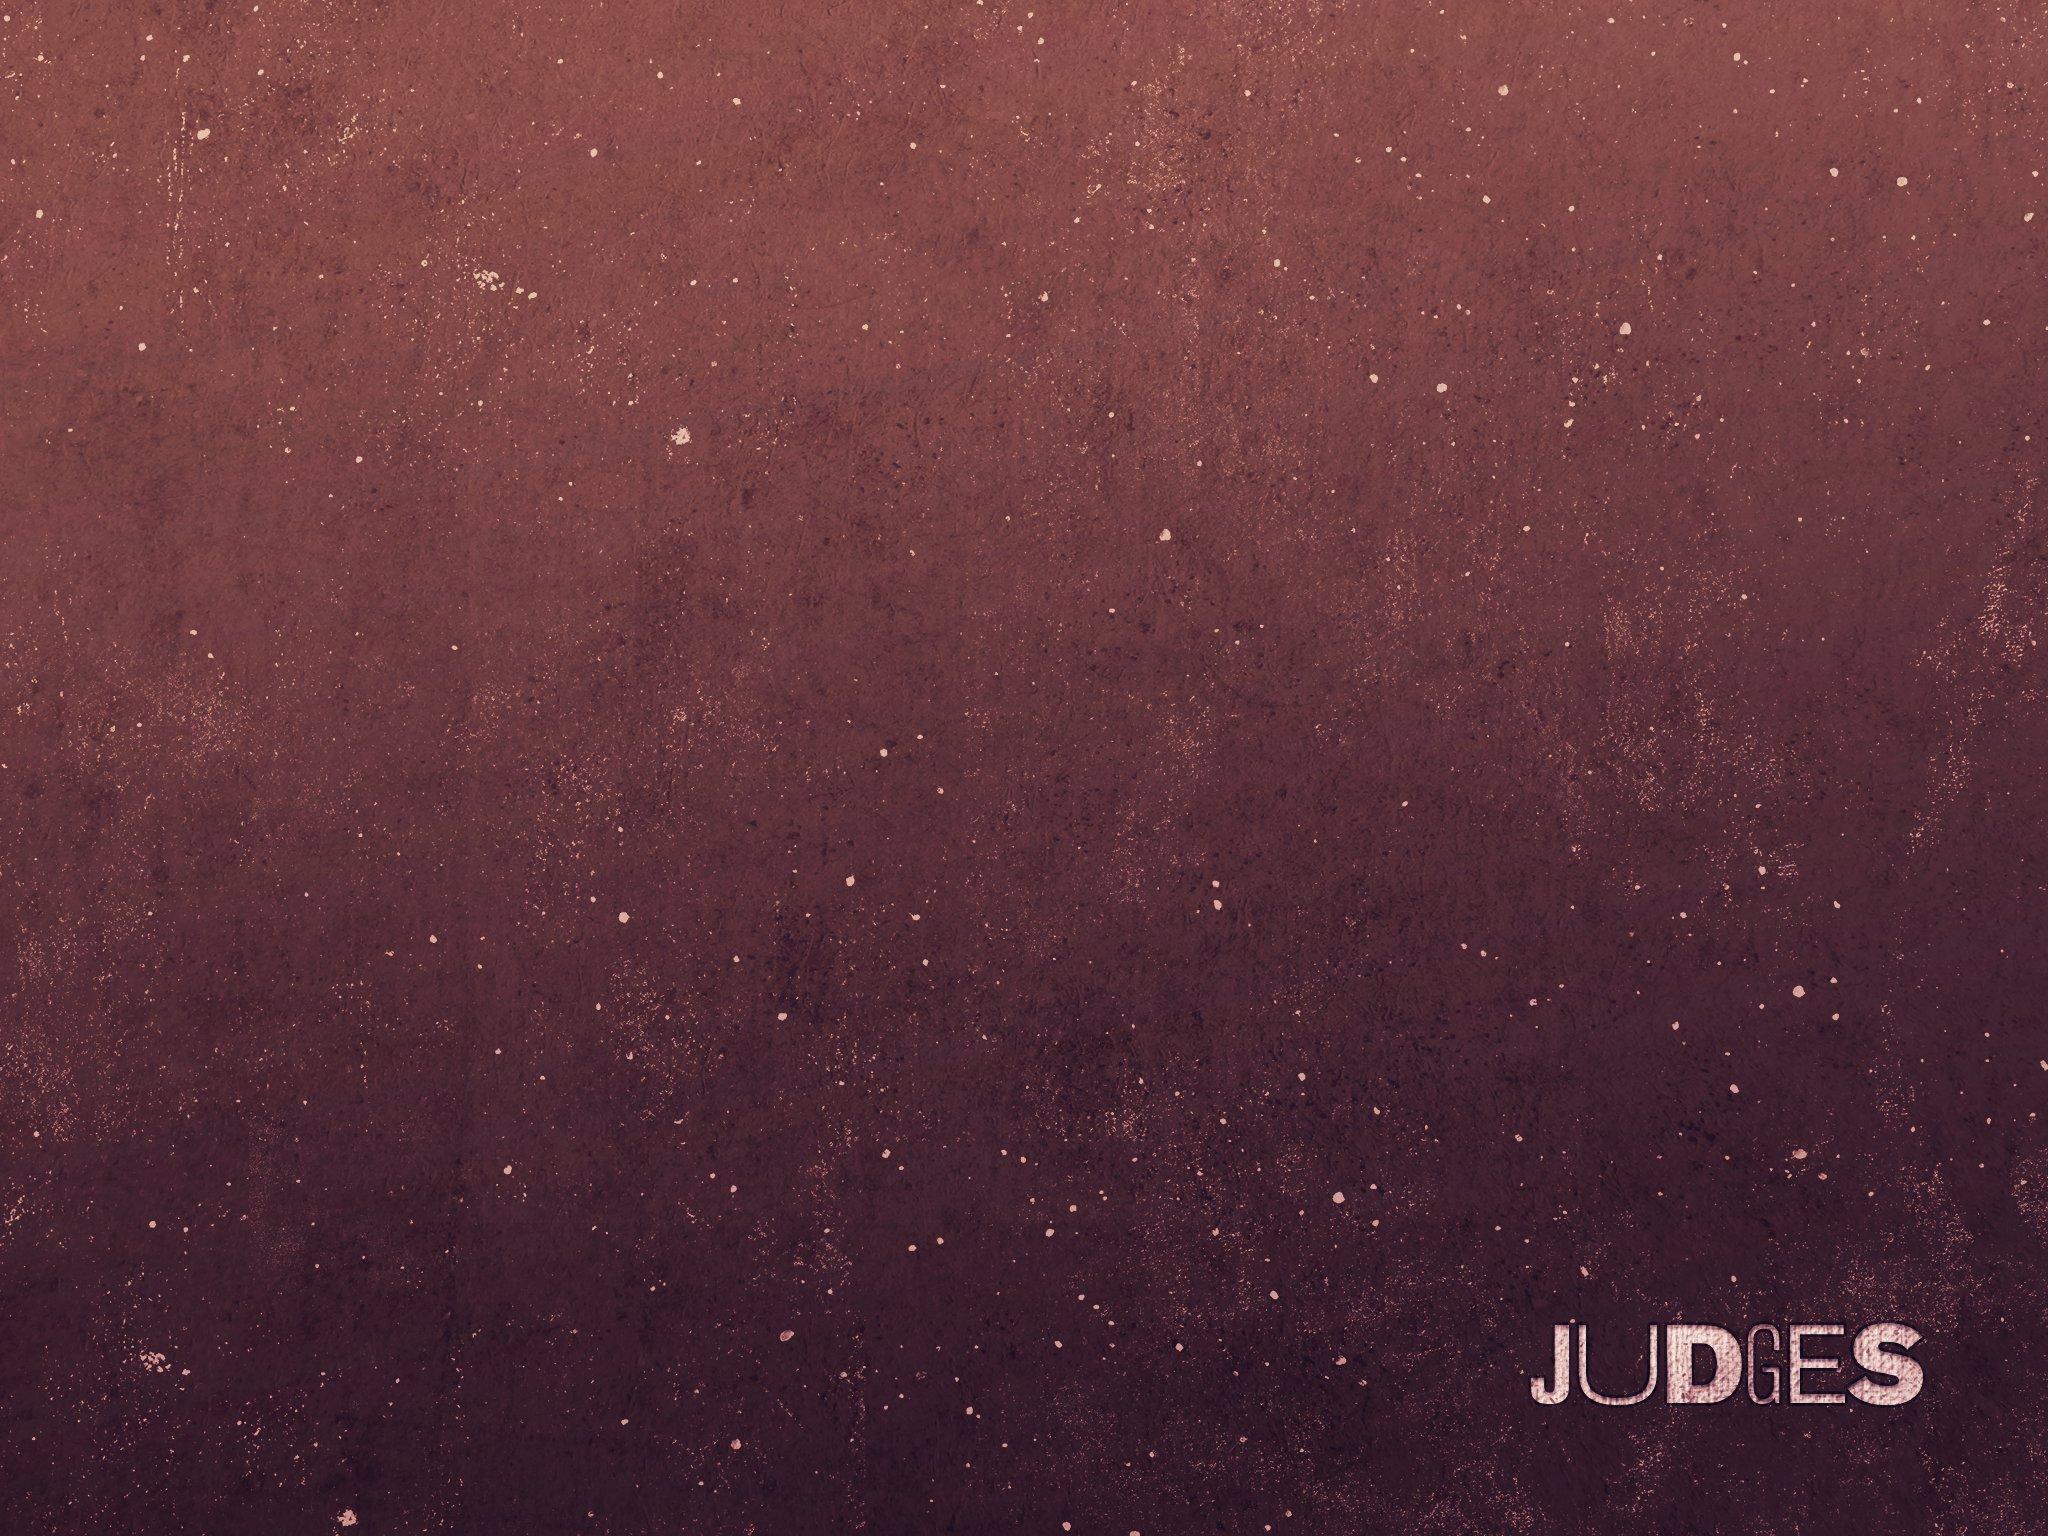 07-Judges_Secondary_4x3-fullscreen.jpg